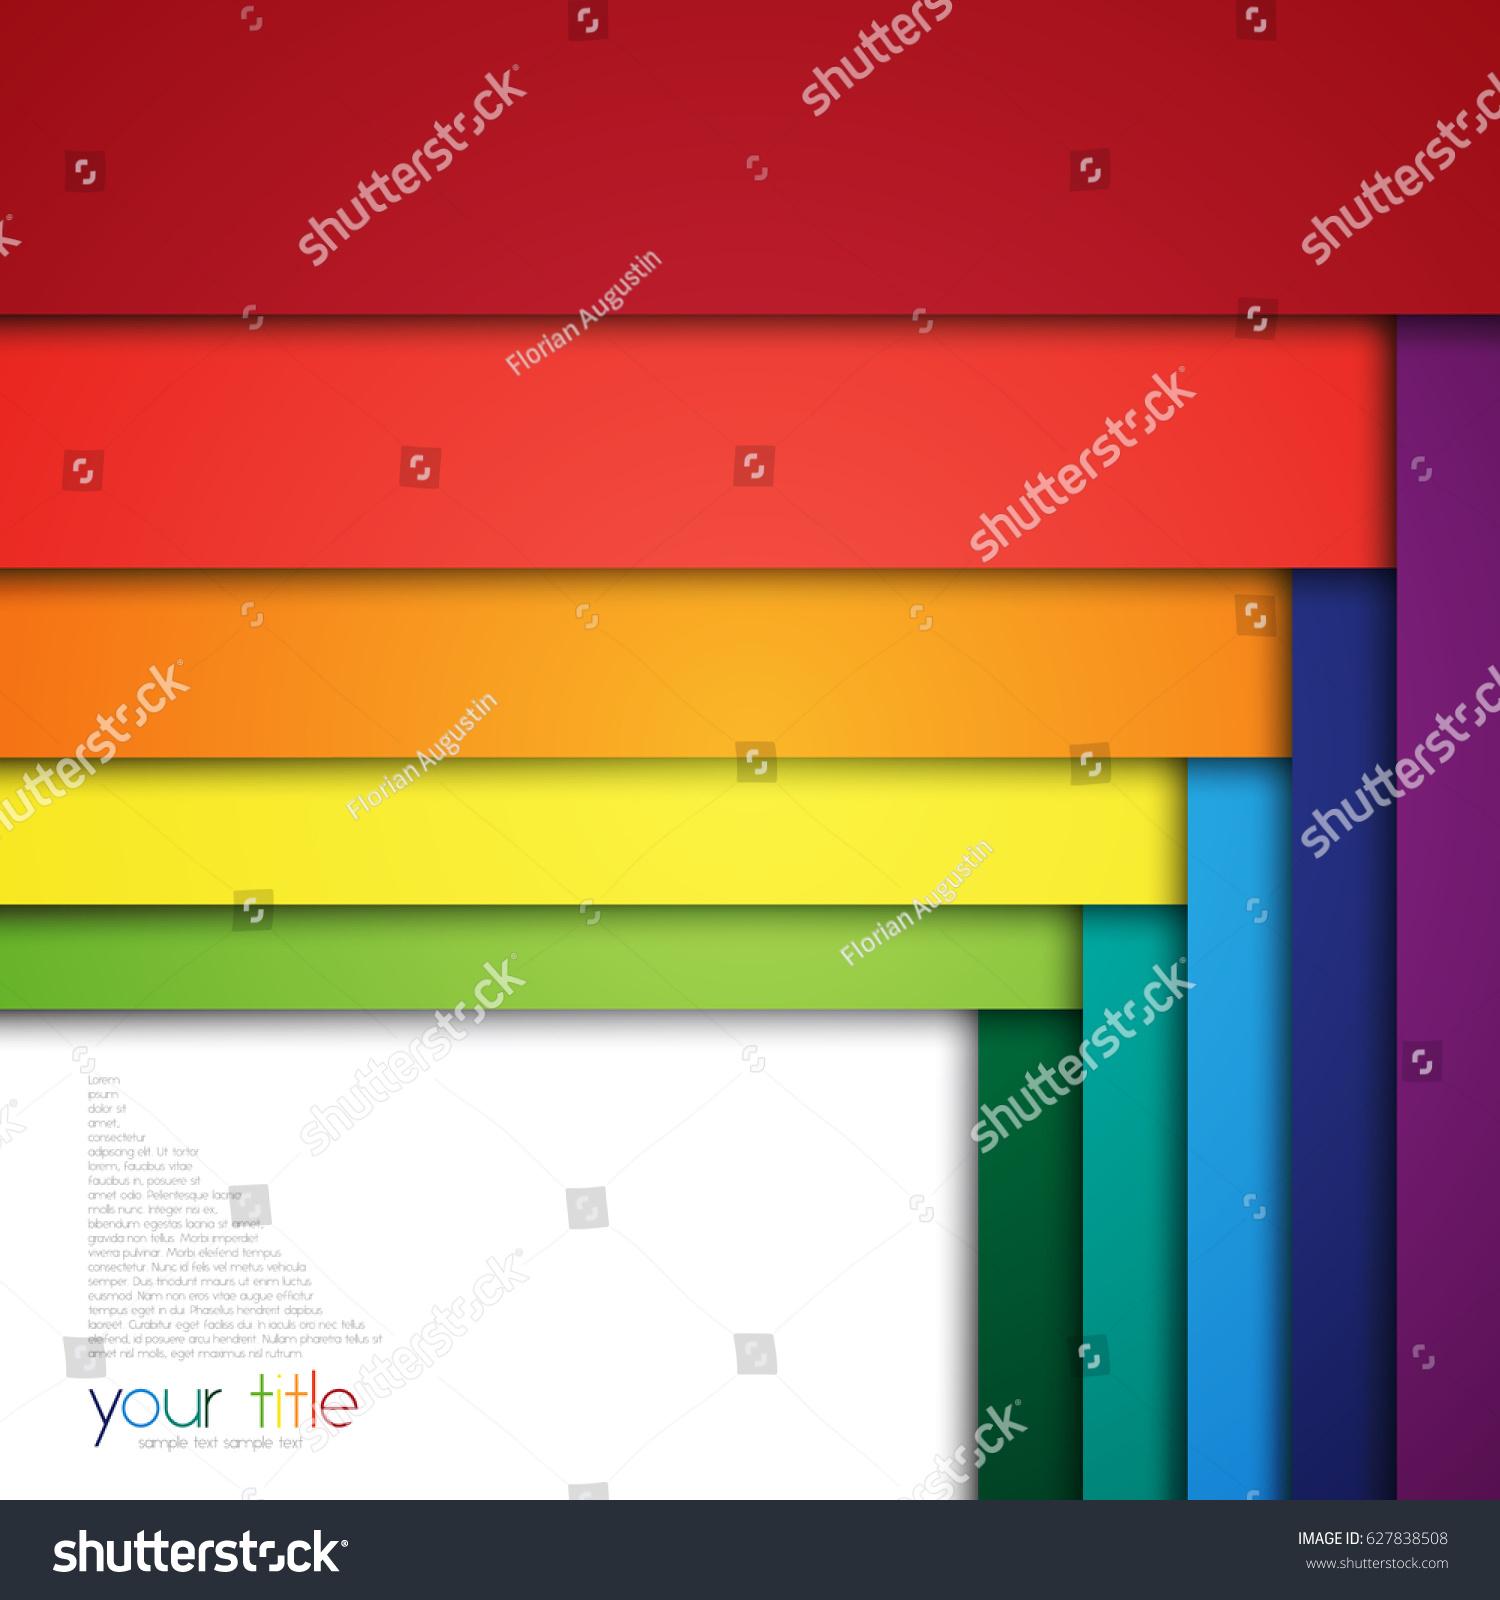 3d design color banners website presentation stock vector, Presentation templates